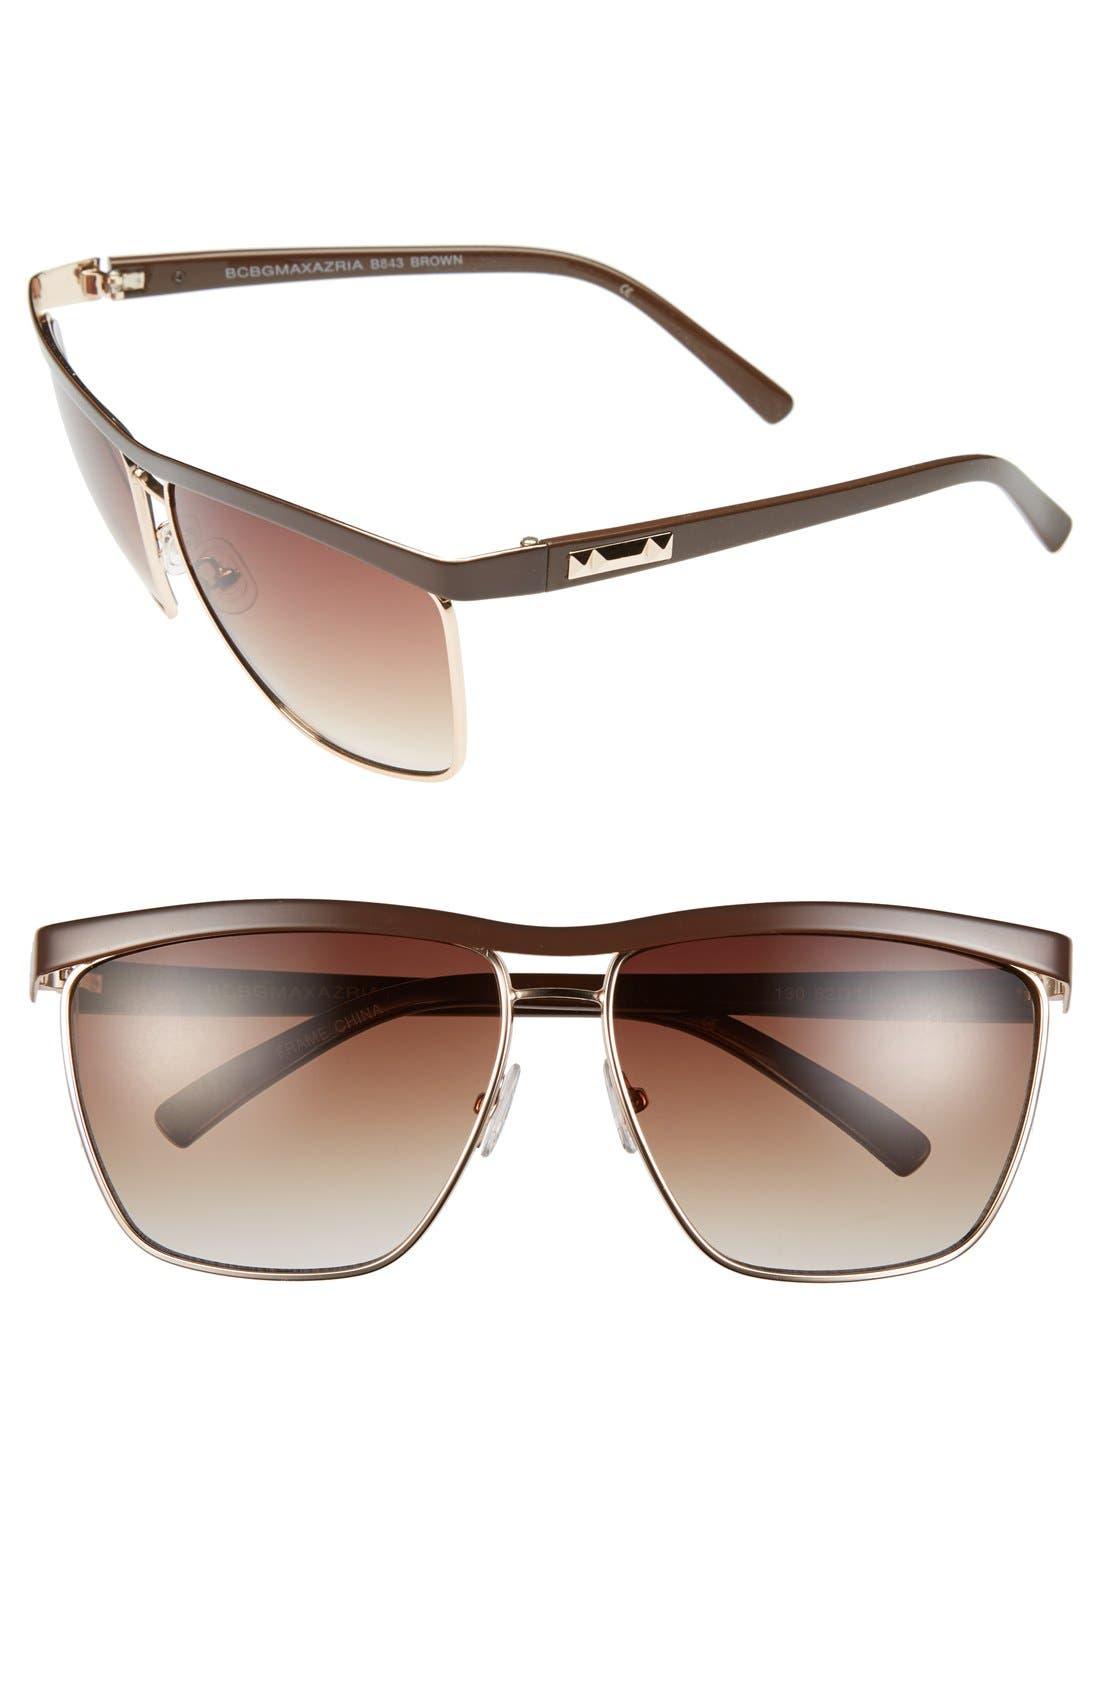 Main Image - BCBGMAXAZRIA 62mm Sunglasses